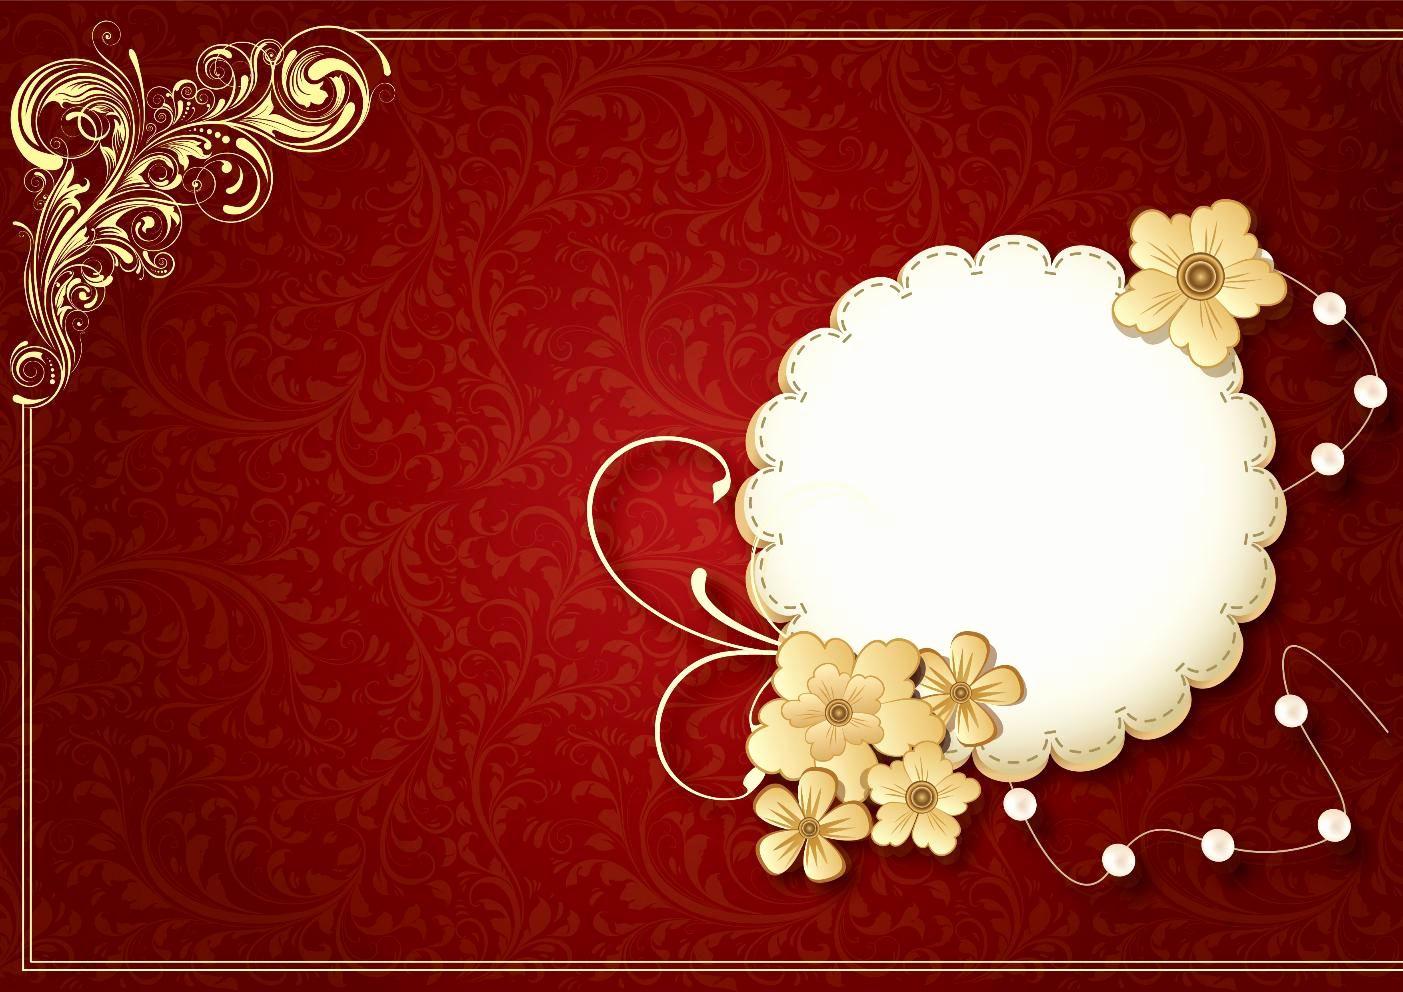 Invitation Card for Weddings New Impressive Design Wedding Invitation Card Wedding